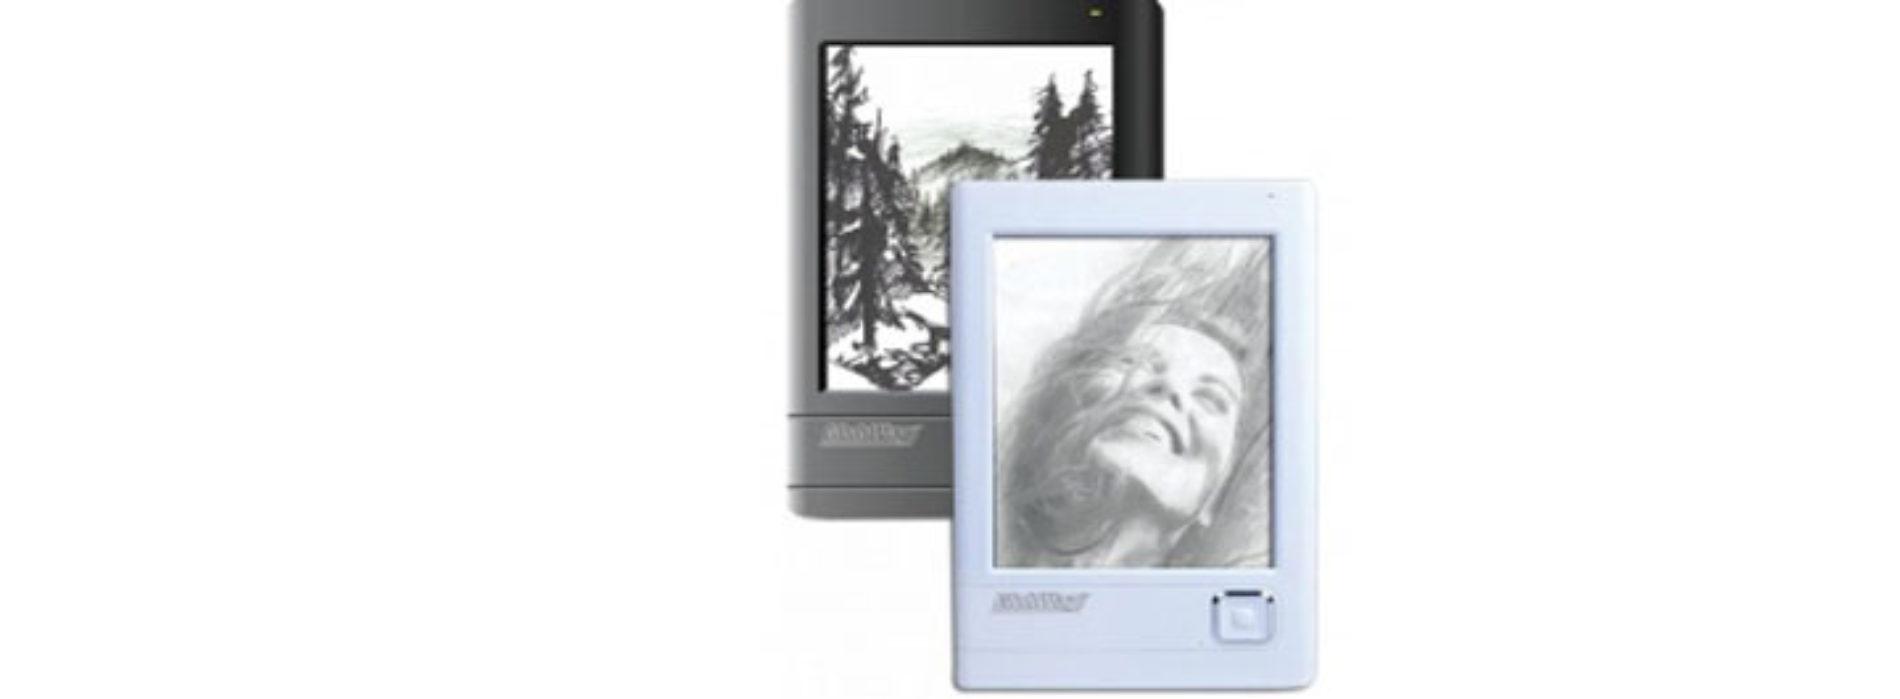 Ремонт электронных книг Globway